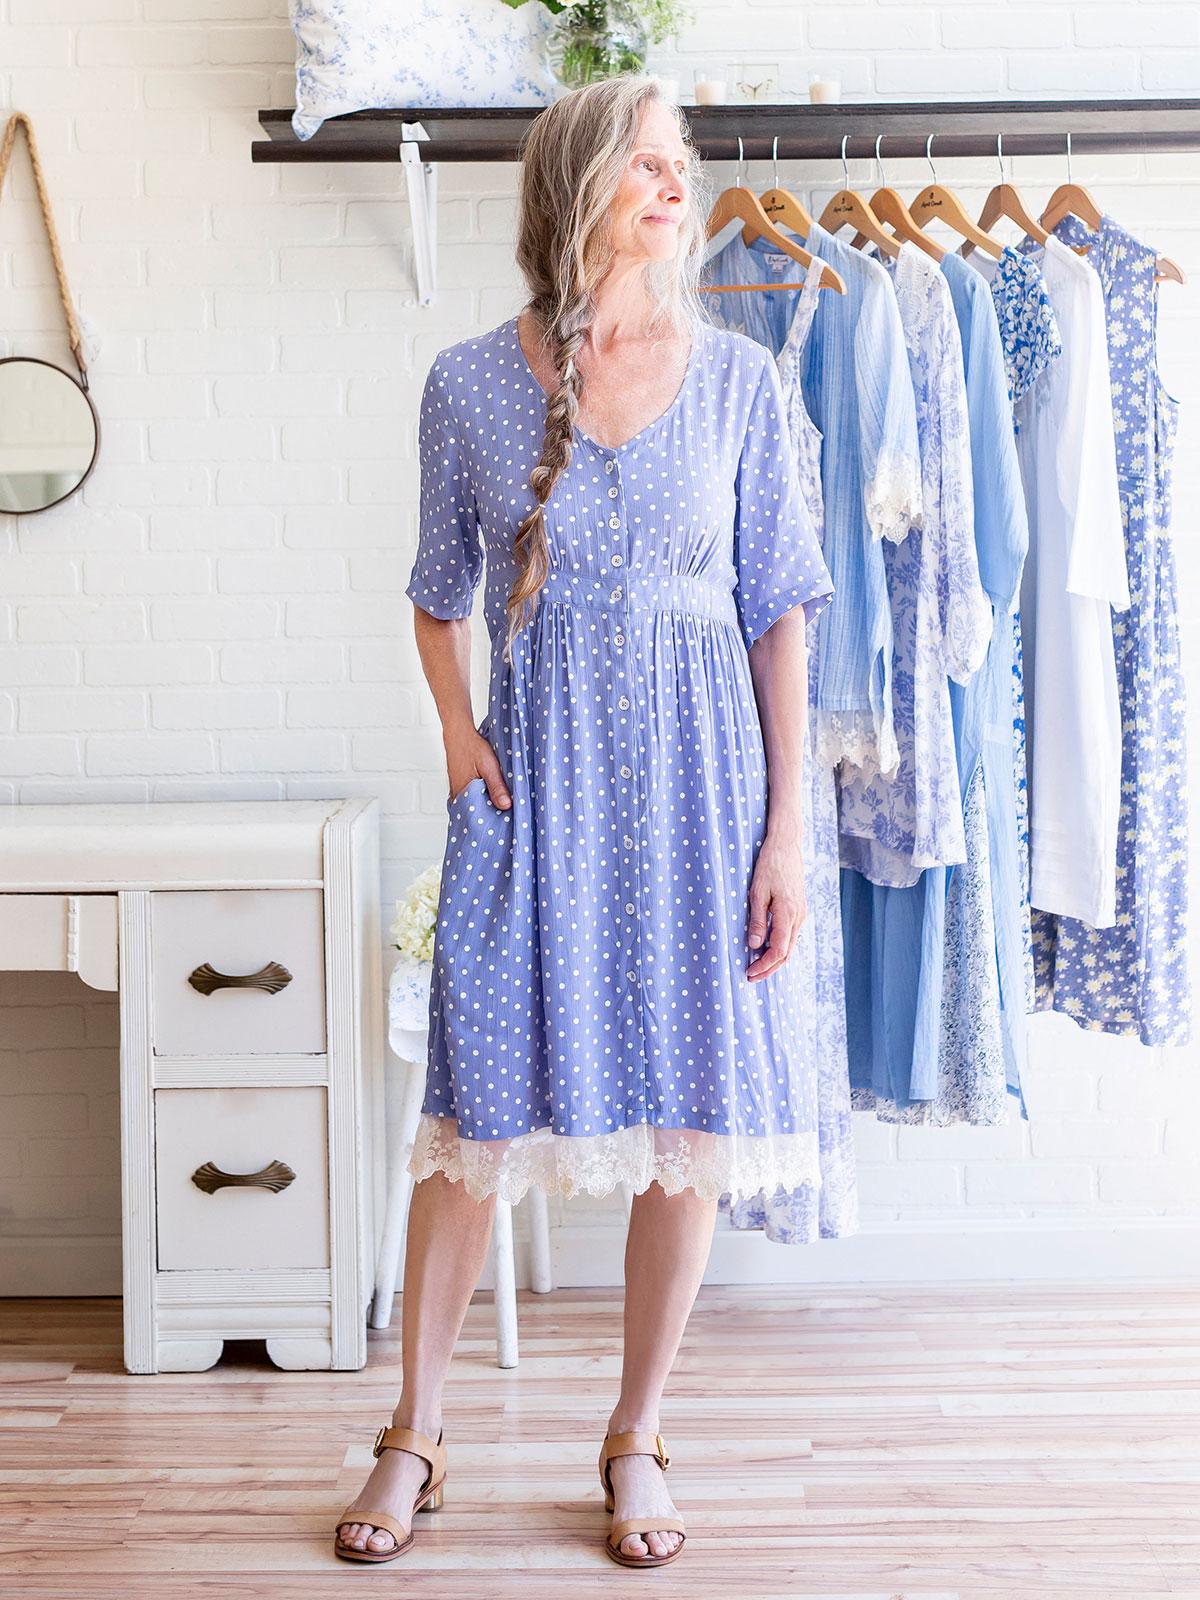 Polly's Polka Dot Dress